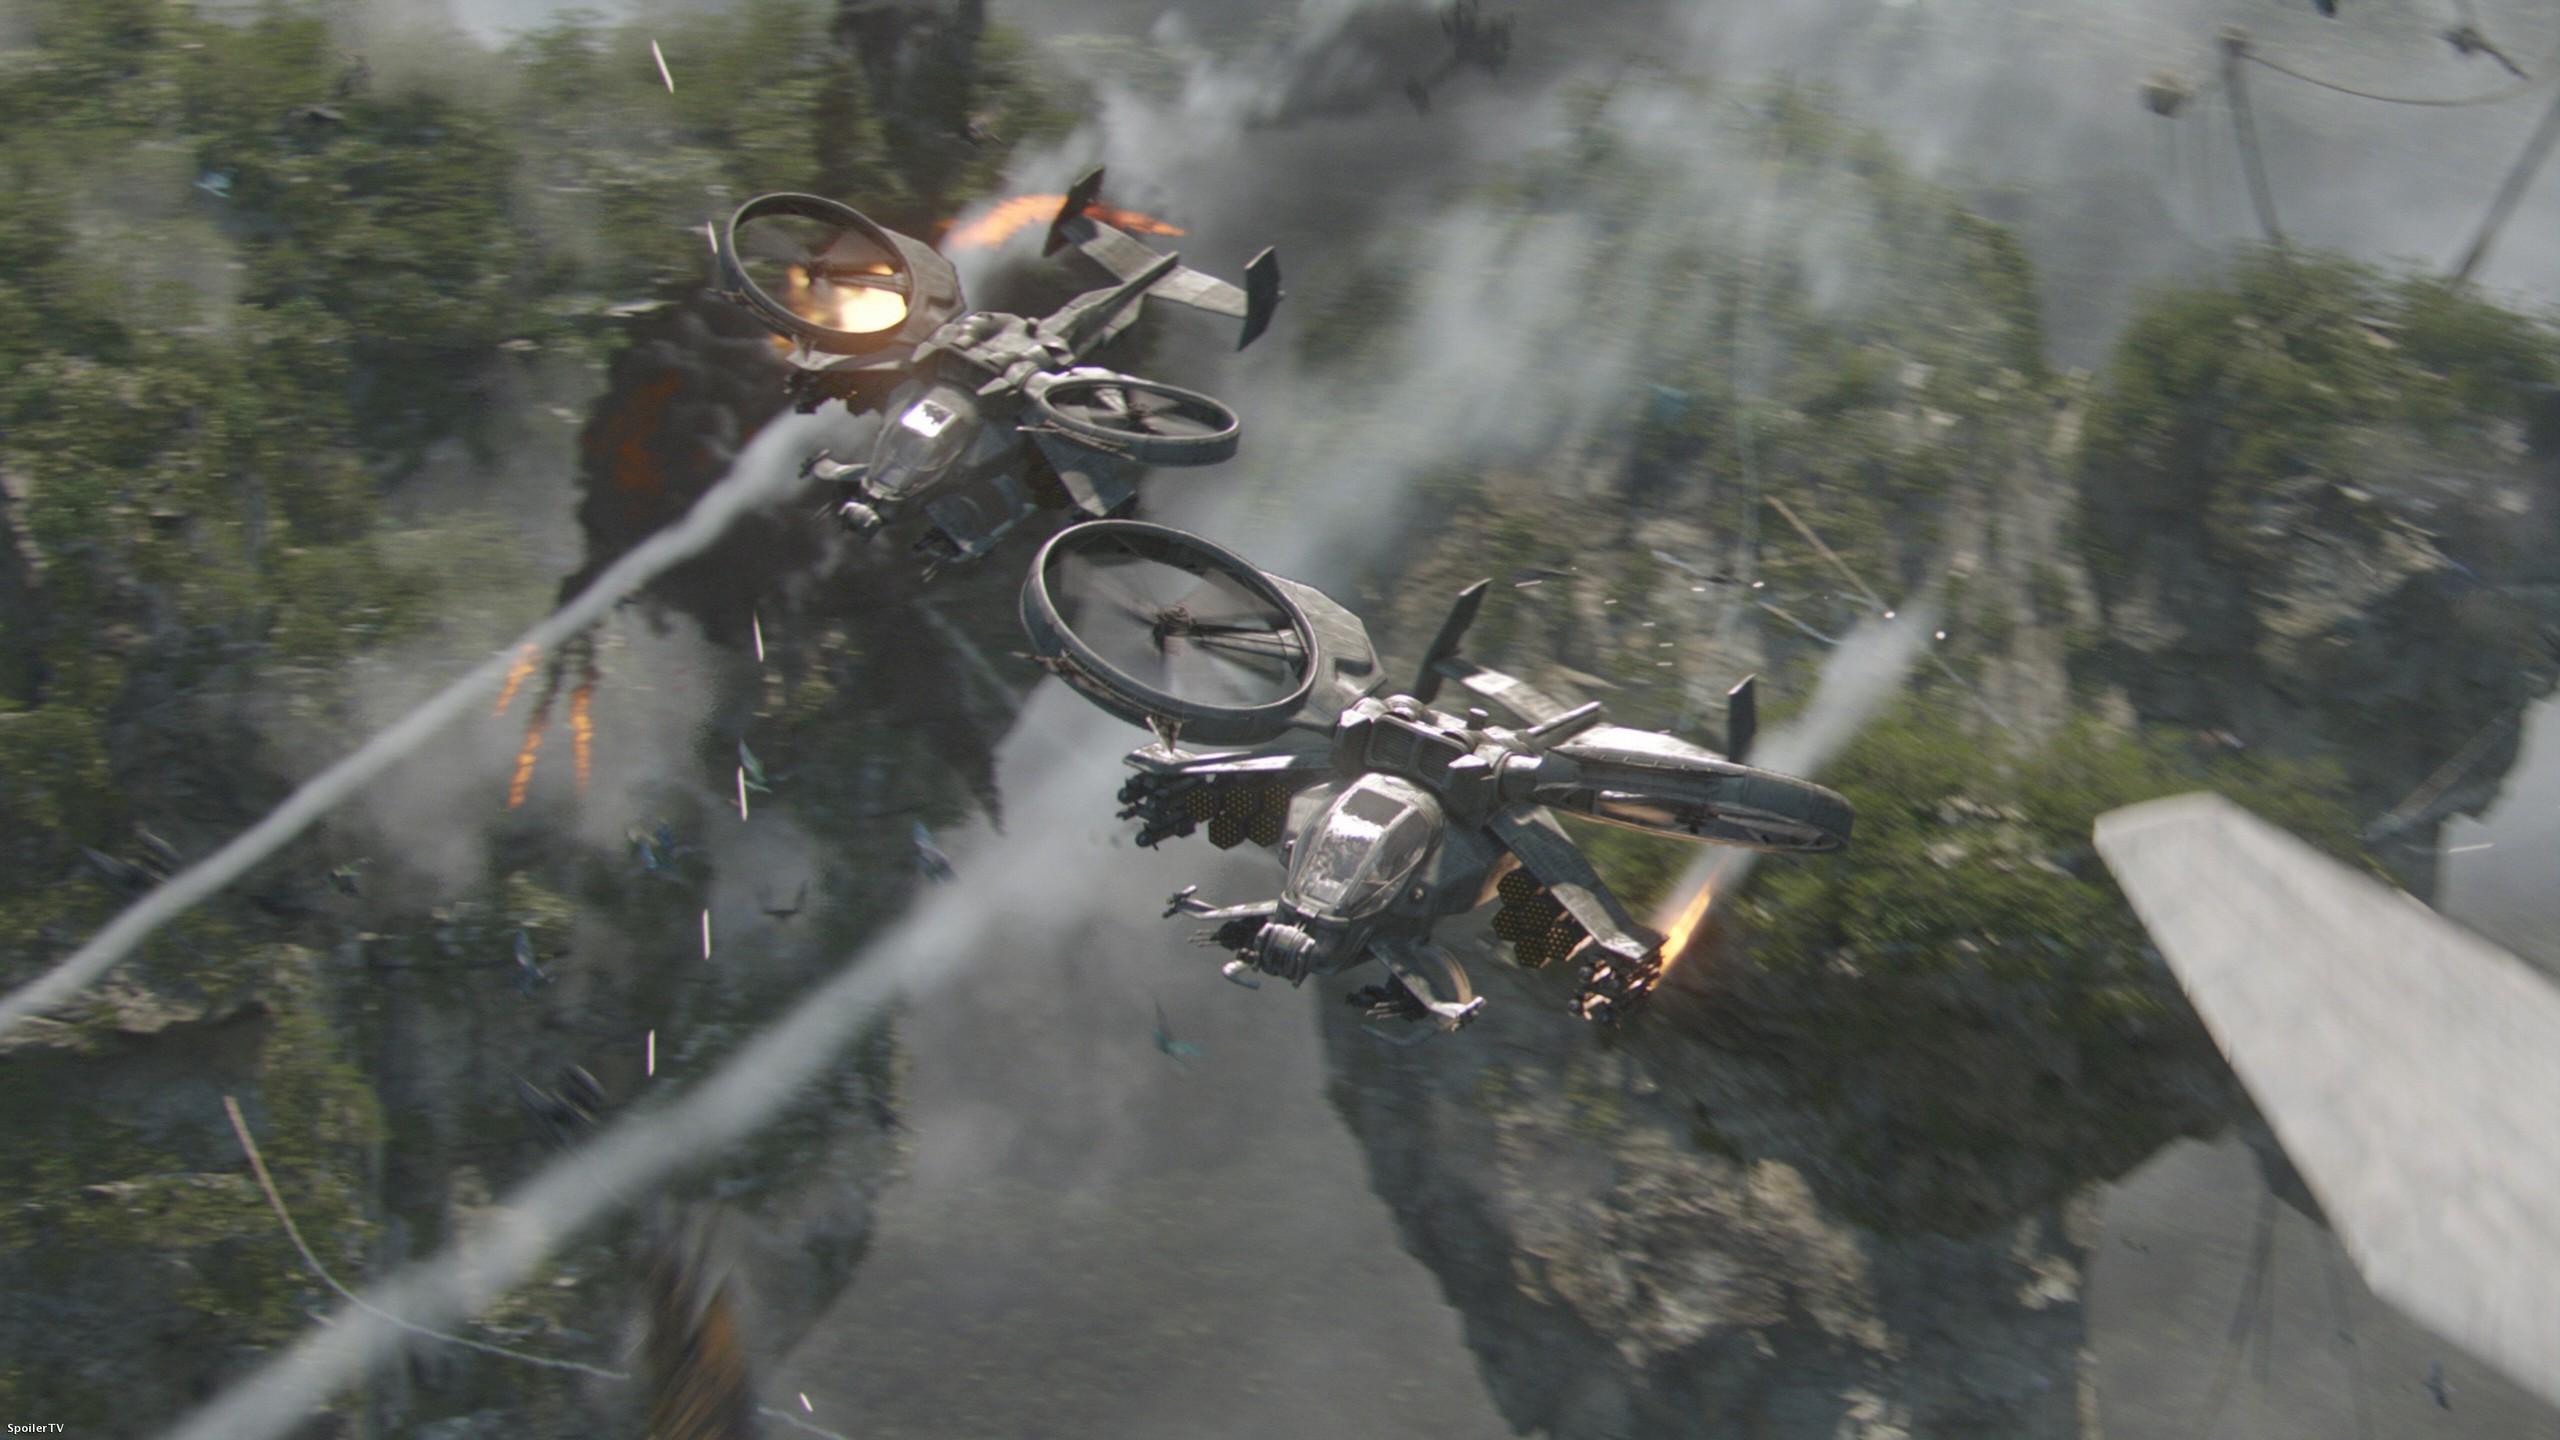 http://images2.wikia.nocookie.net/jamescameronsavatar/images/5/5e/SamsonScorpion.jpg